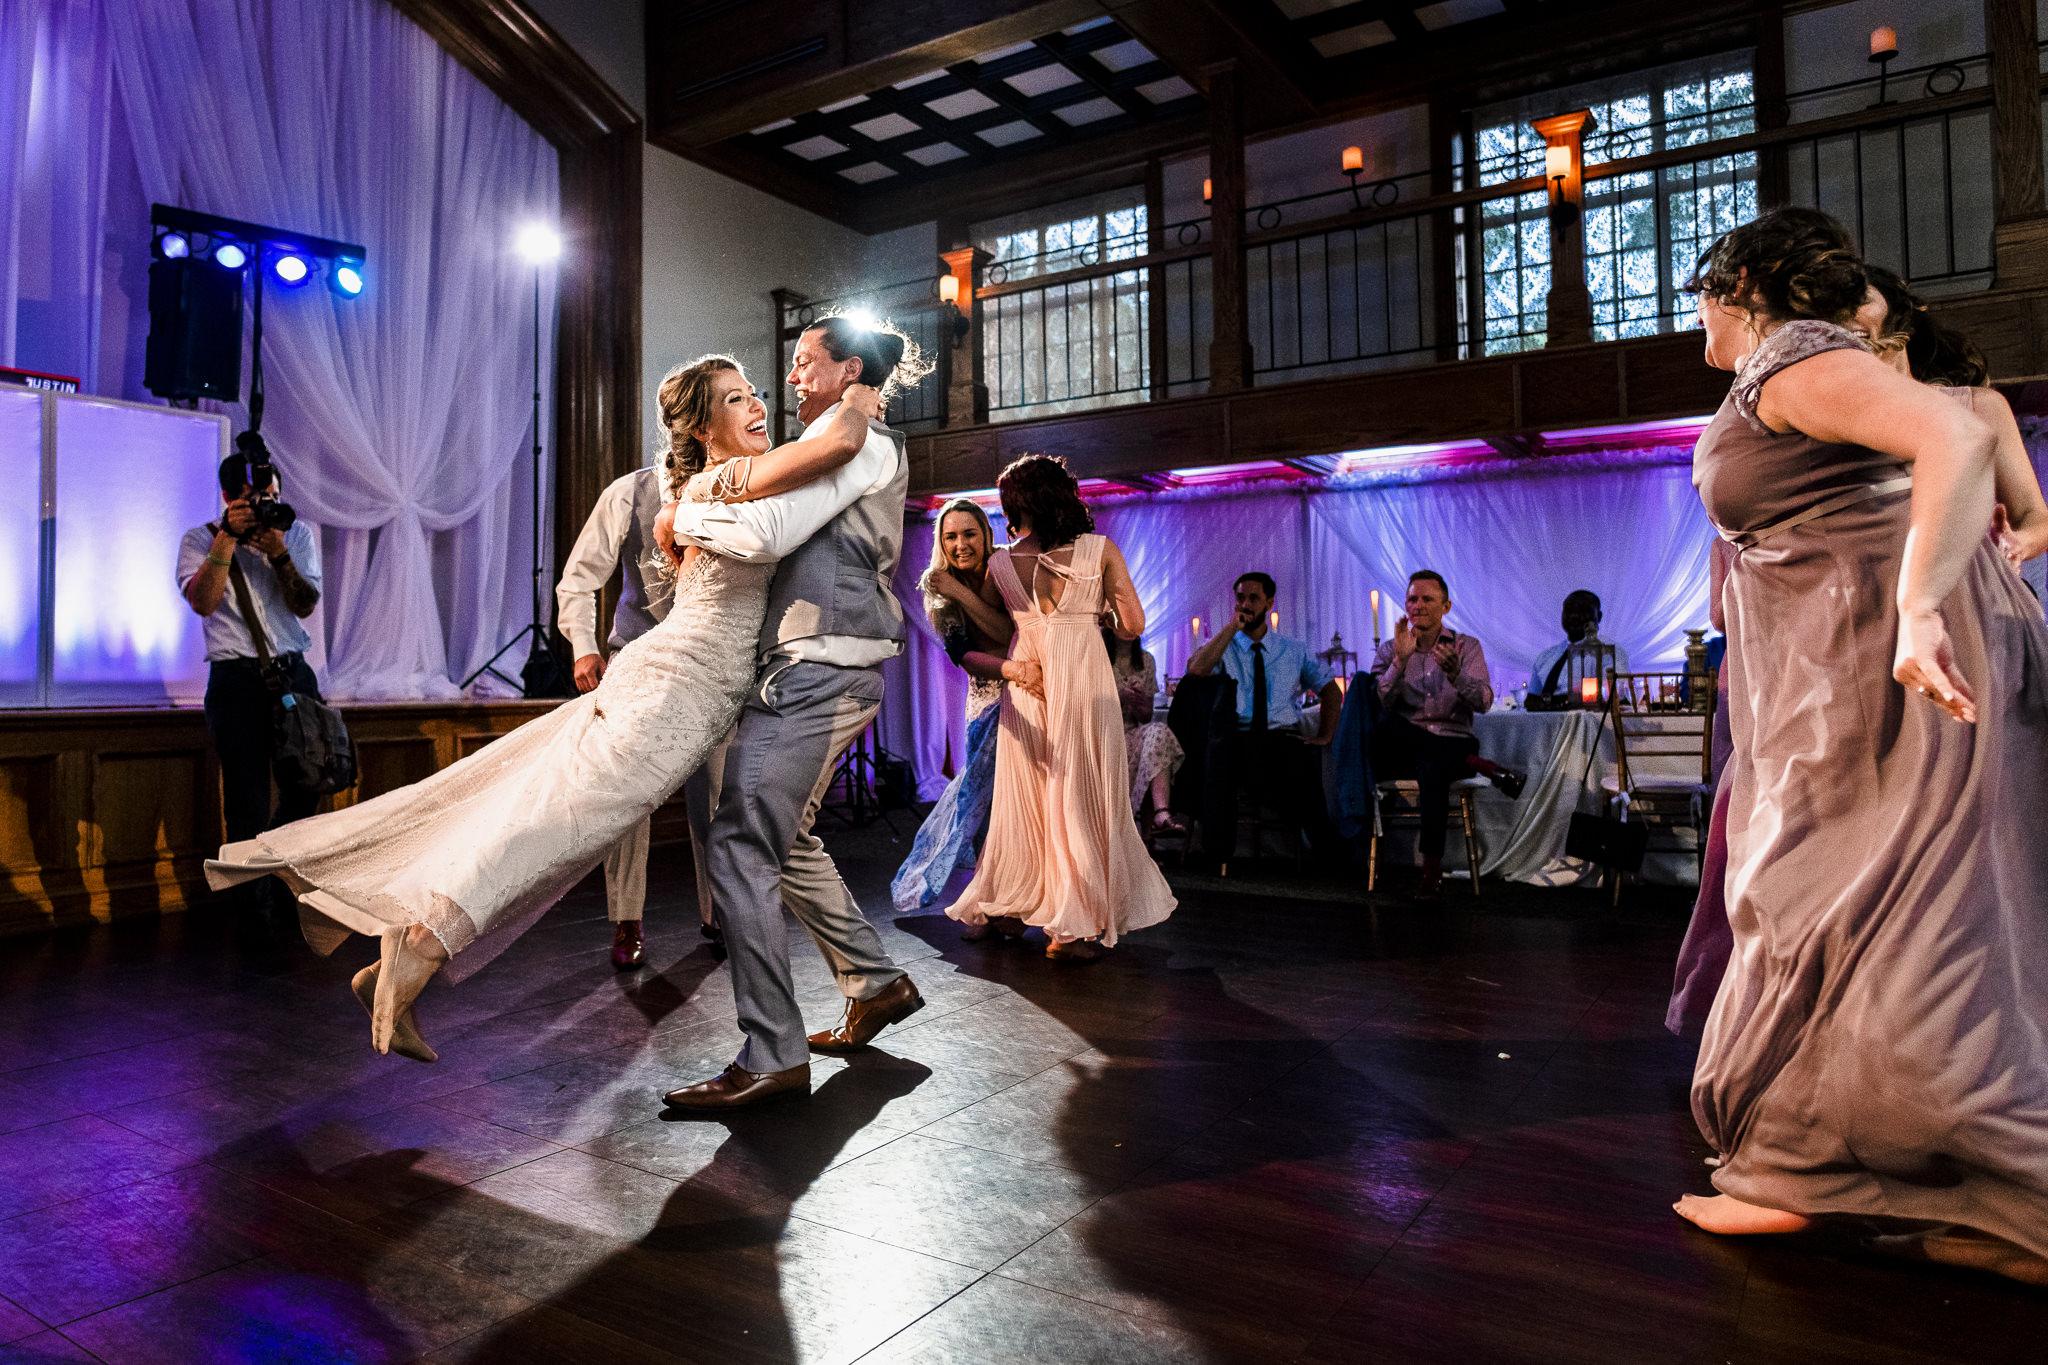 Barbato-Moorestown-Community-House-Wedding-New-Jersey-Photographer-42.JPG